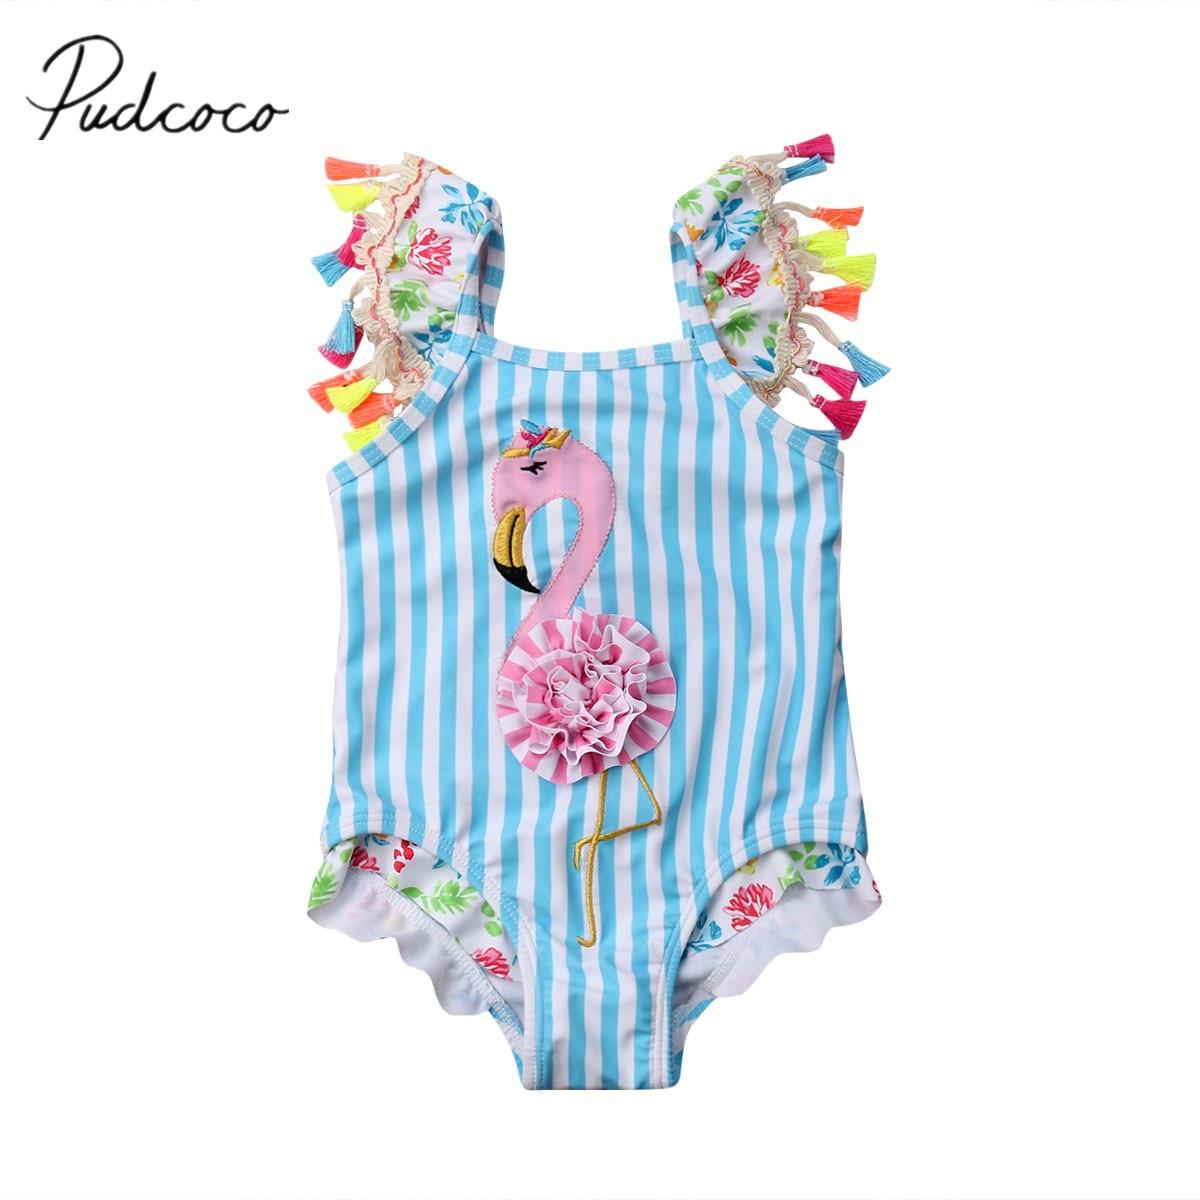 2019 Brand New Newborn Kids Baby Girls Flamingo Bikini Colorful Tassel Sleeve Swimwear Swimsuit Bathing Suit Beachwear 6M-5T